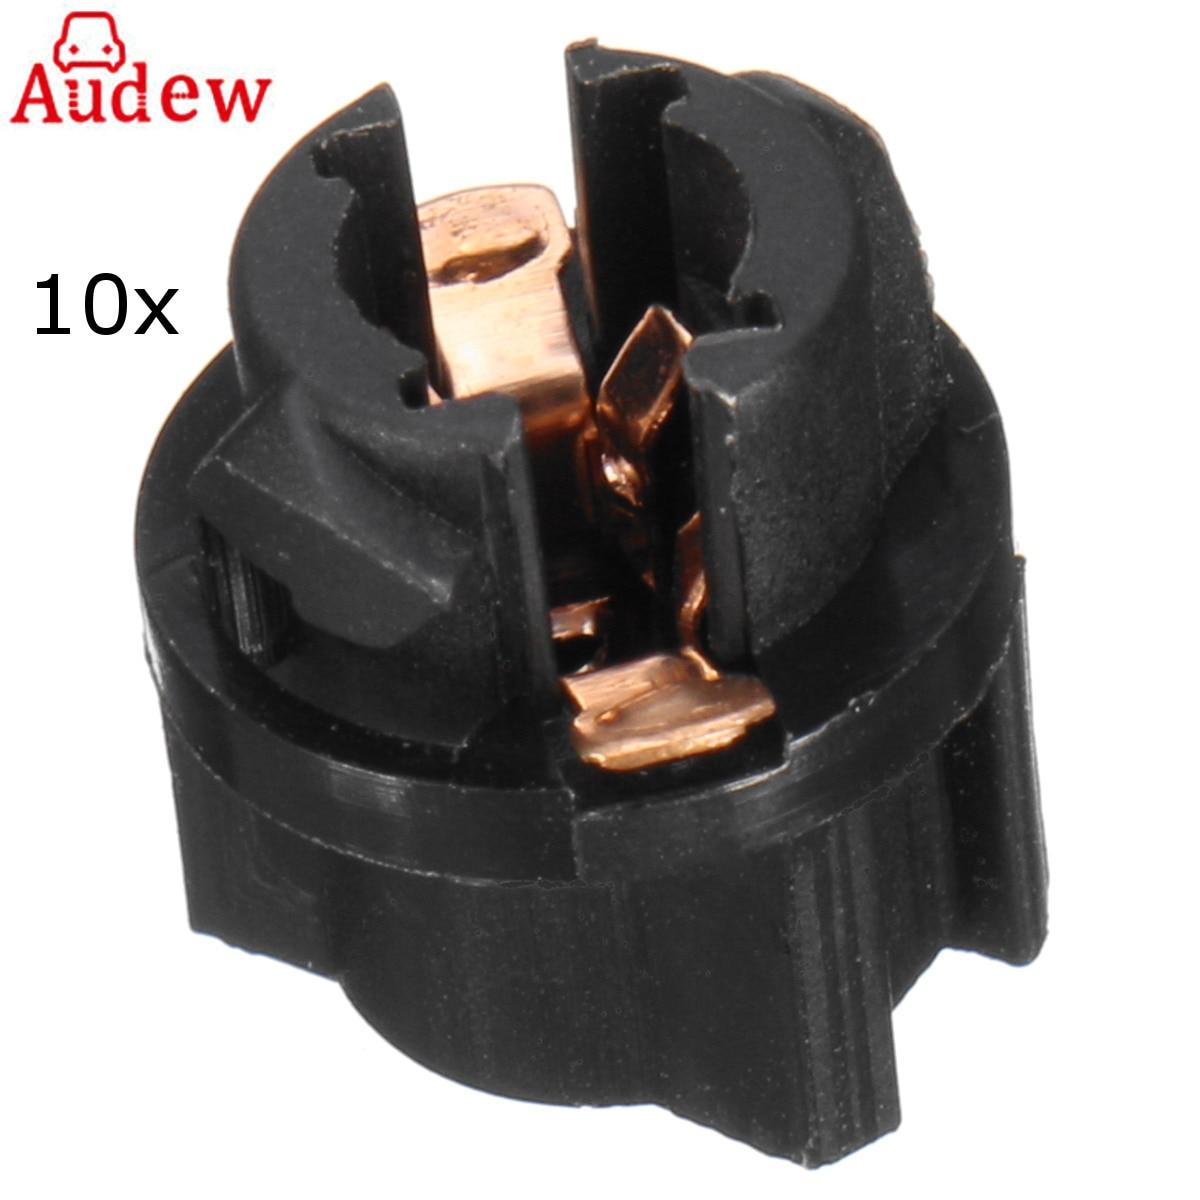 10pcs T5 Base Car Instrument Light Socket Twist Lock For PC74 Instrument Panel Cluster Plug Dash Light Bulb